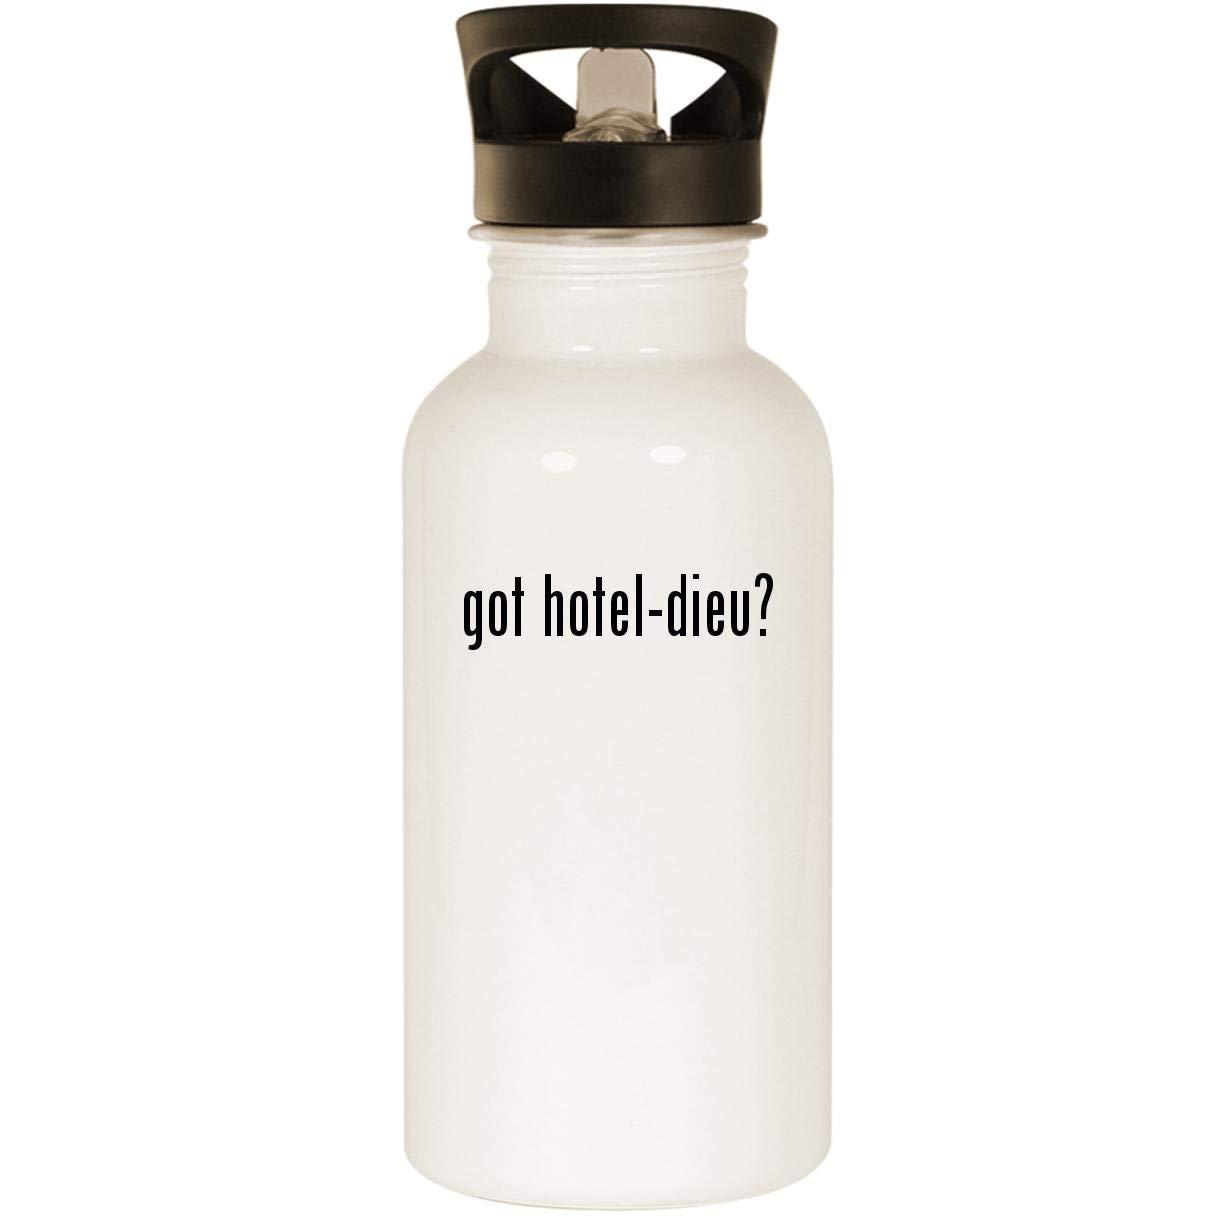 got hotel-Dieu? - Stainless Steel 20oz Road Ready Water Bottle, White